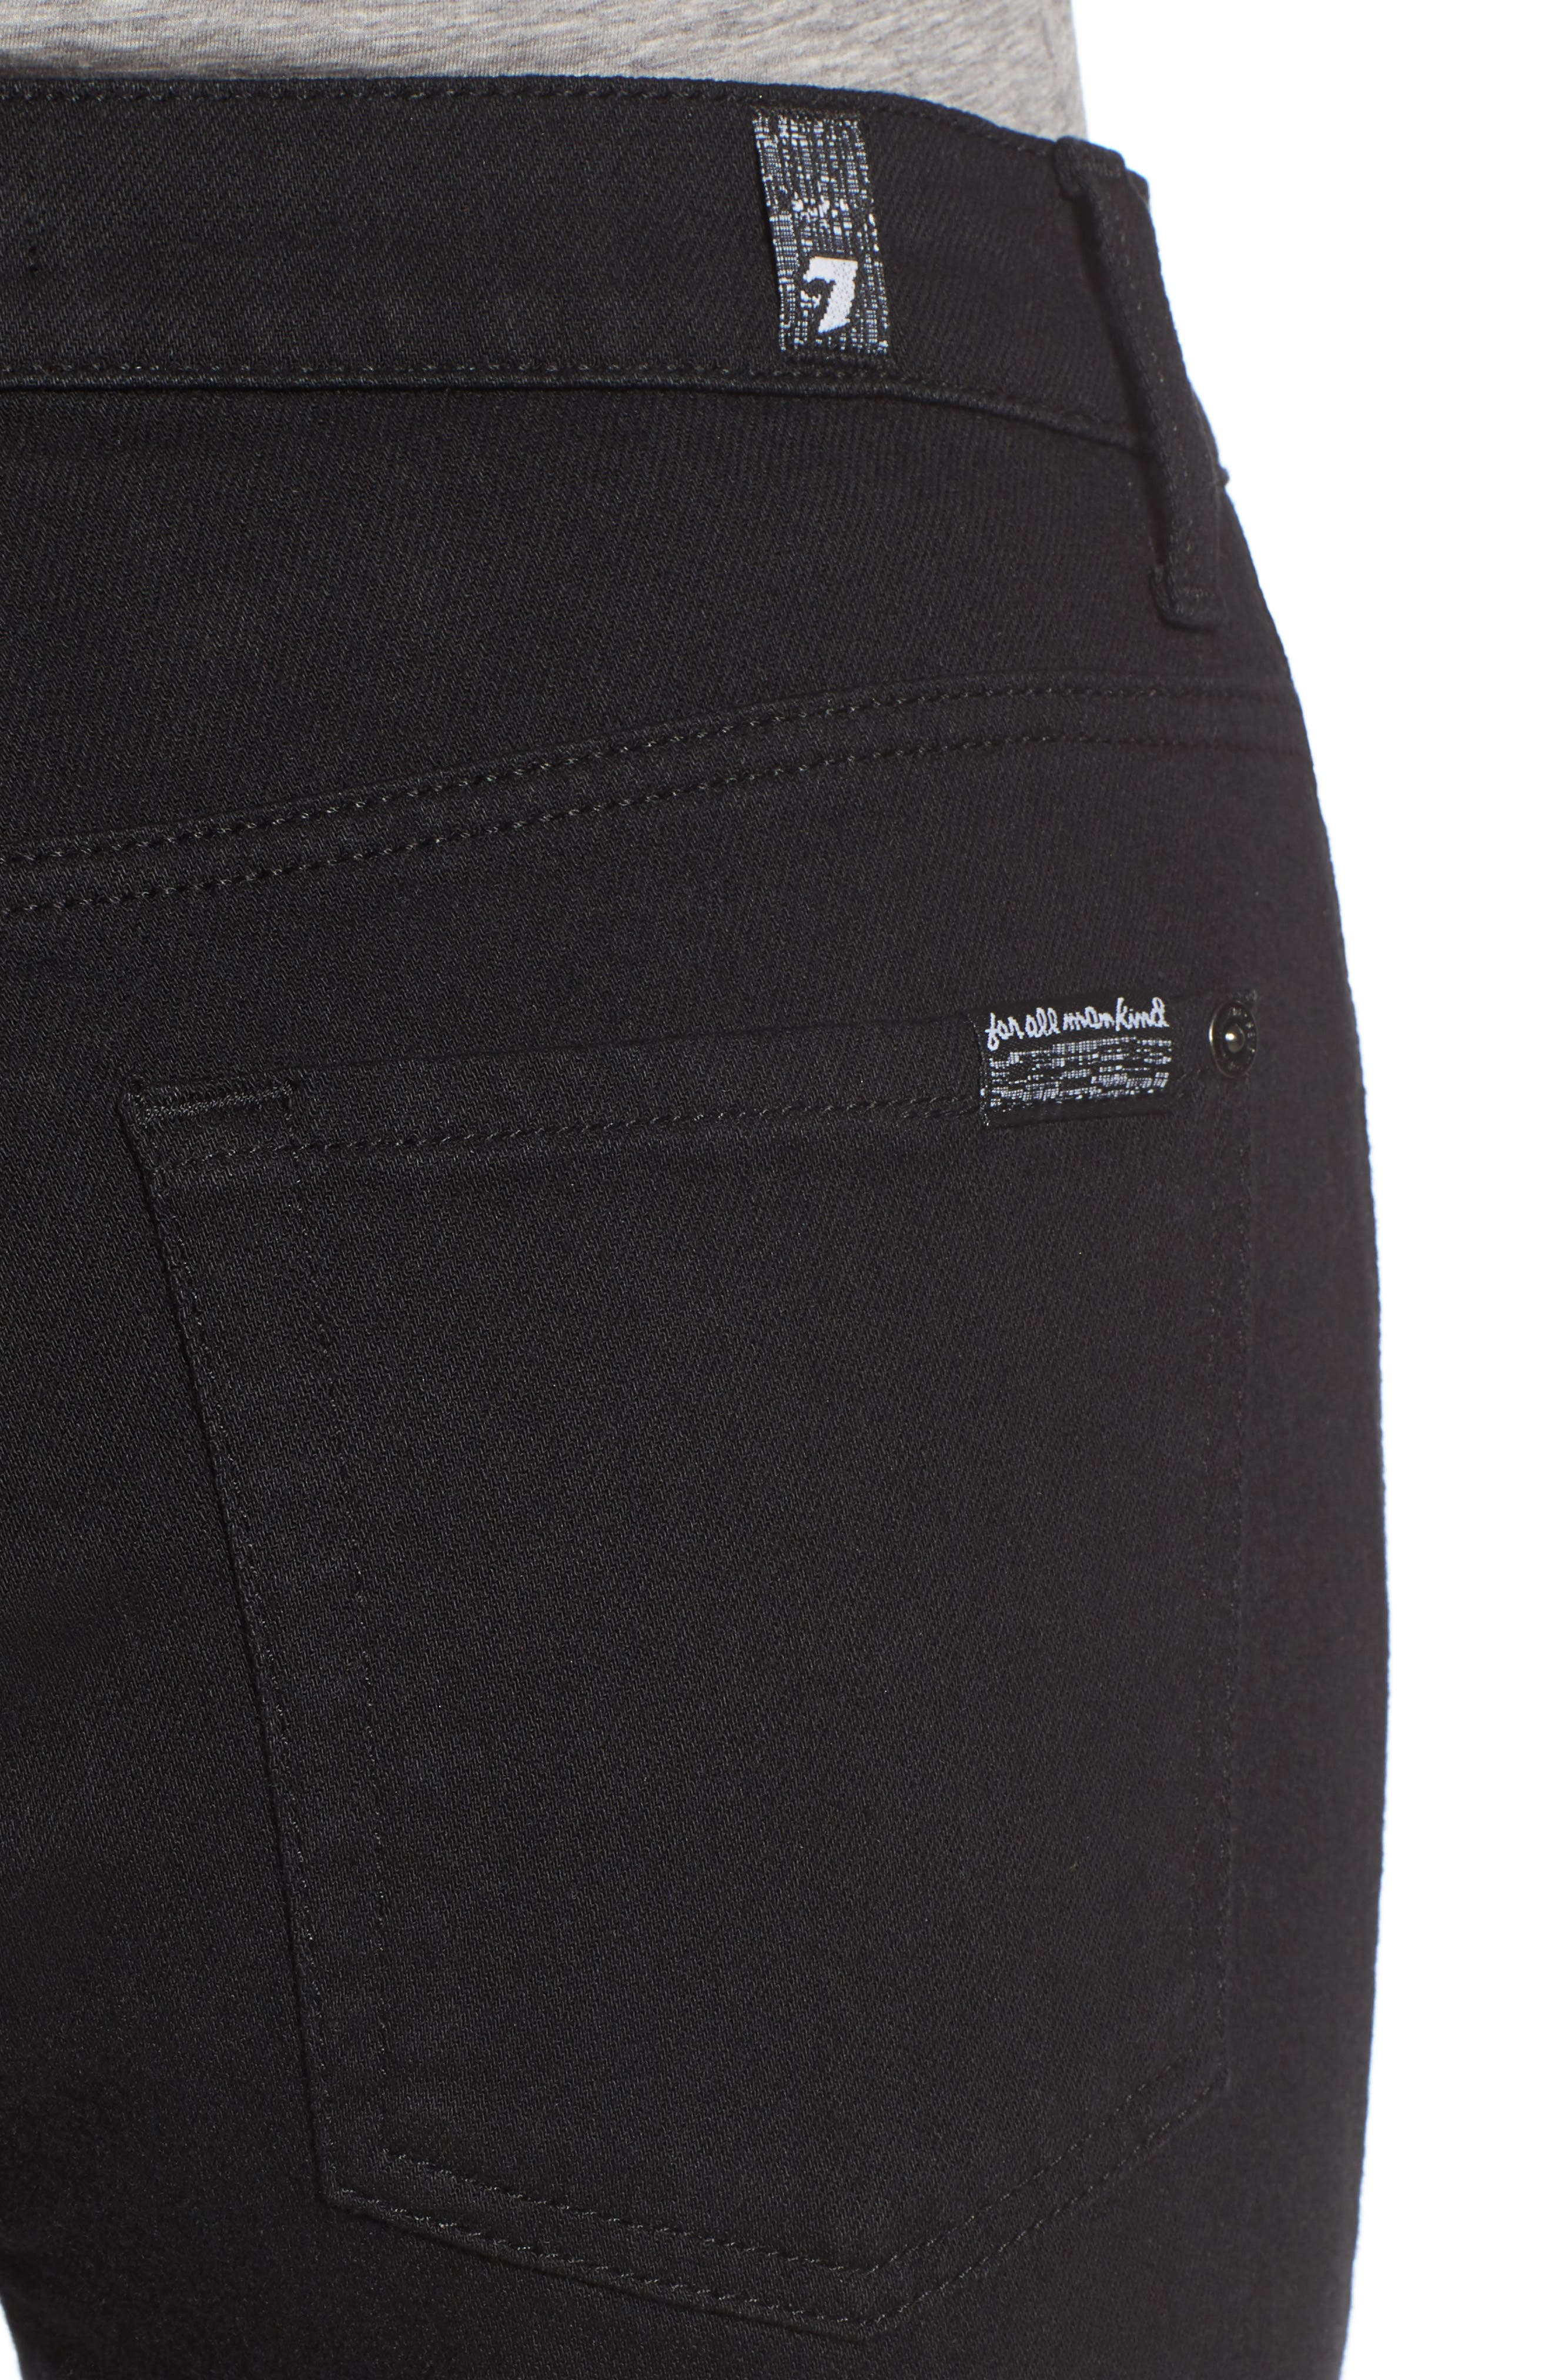 Priscilla High Waist Crop Flare Jeans,                             Alternate thumbnail 4, color,                             004